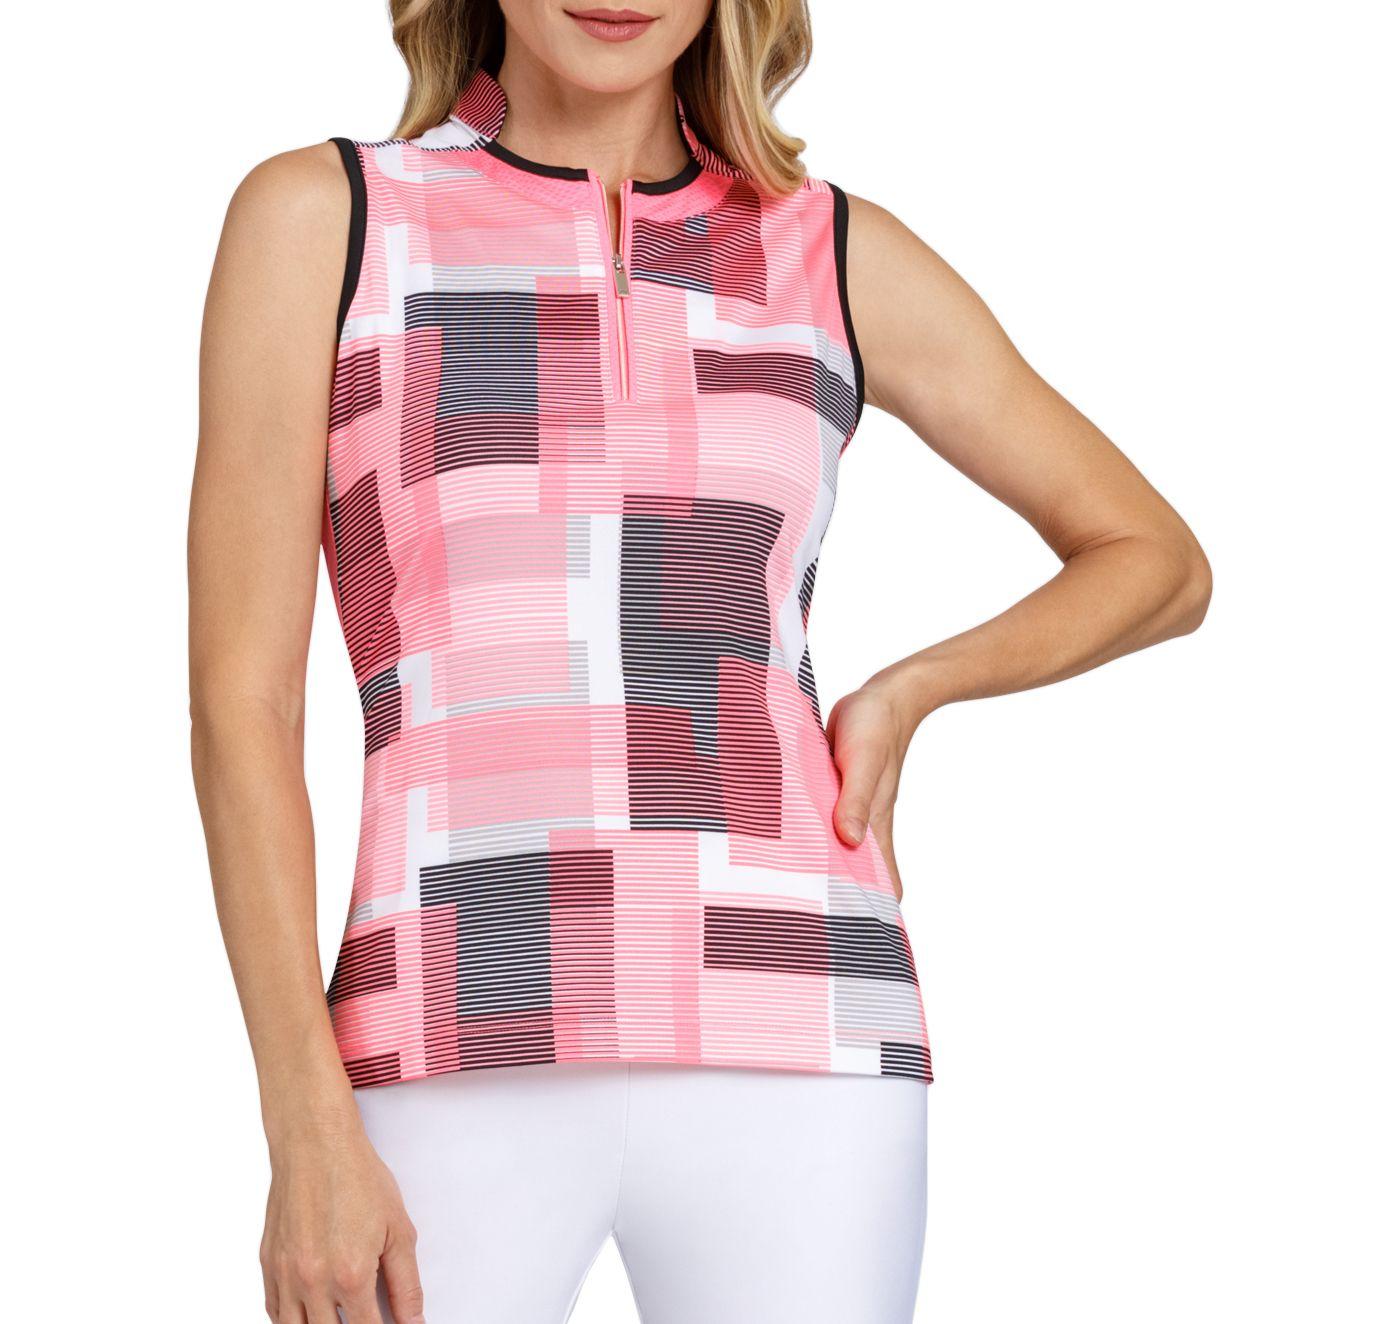 Tail Women's Sleeveless Novelty Collar Golf Polo – Extended Sizes